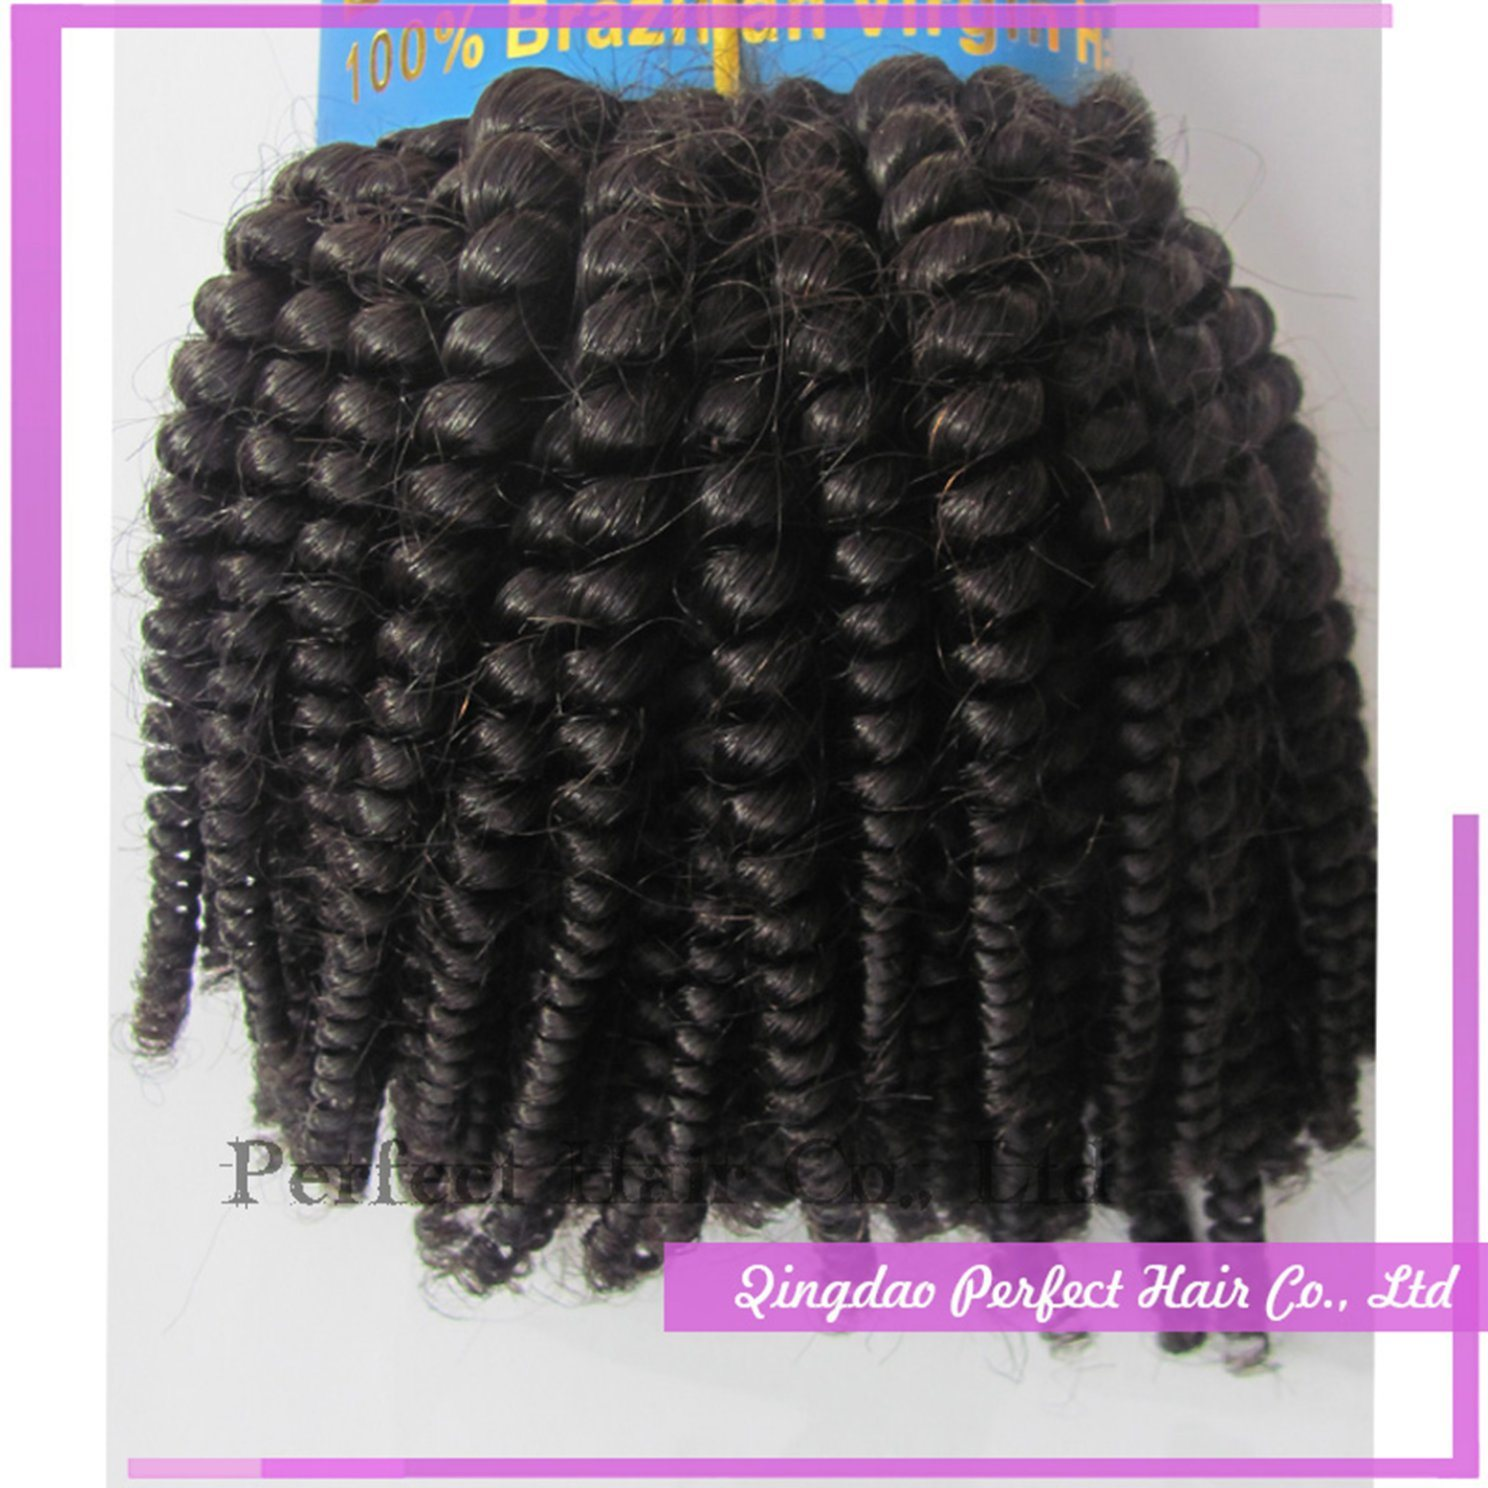 Virgin Brazilian Hair Remy Human Tiger Curly Hair Weft